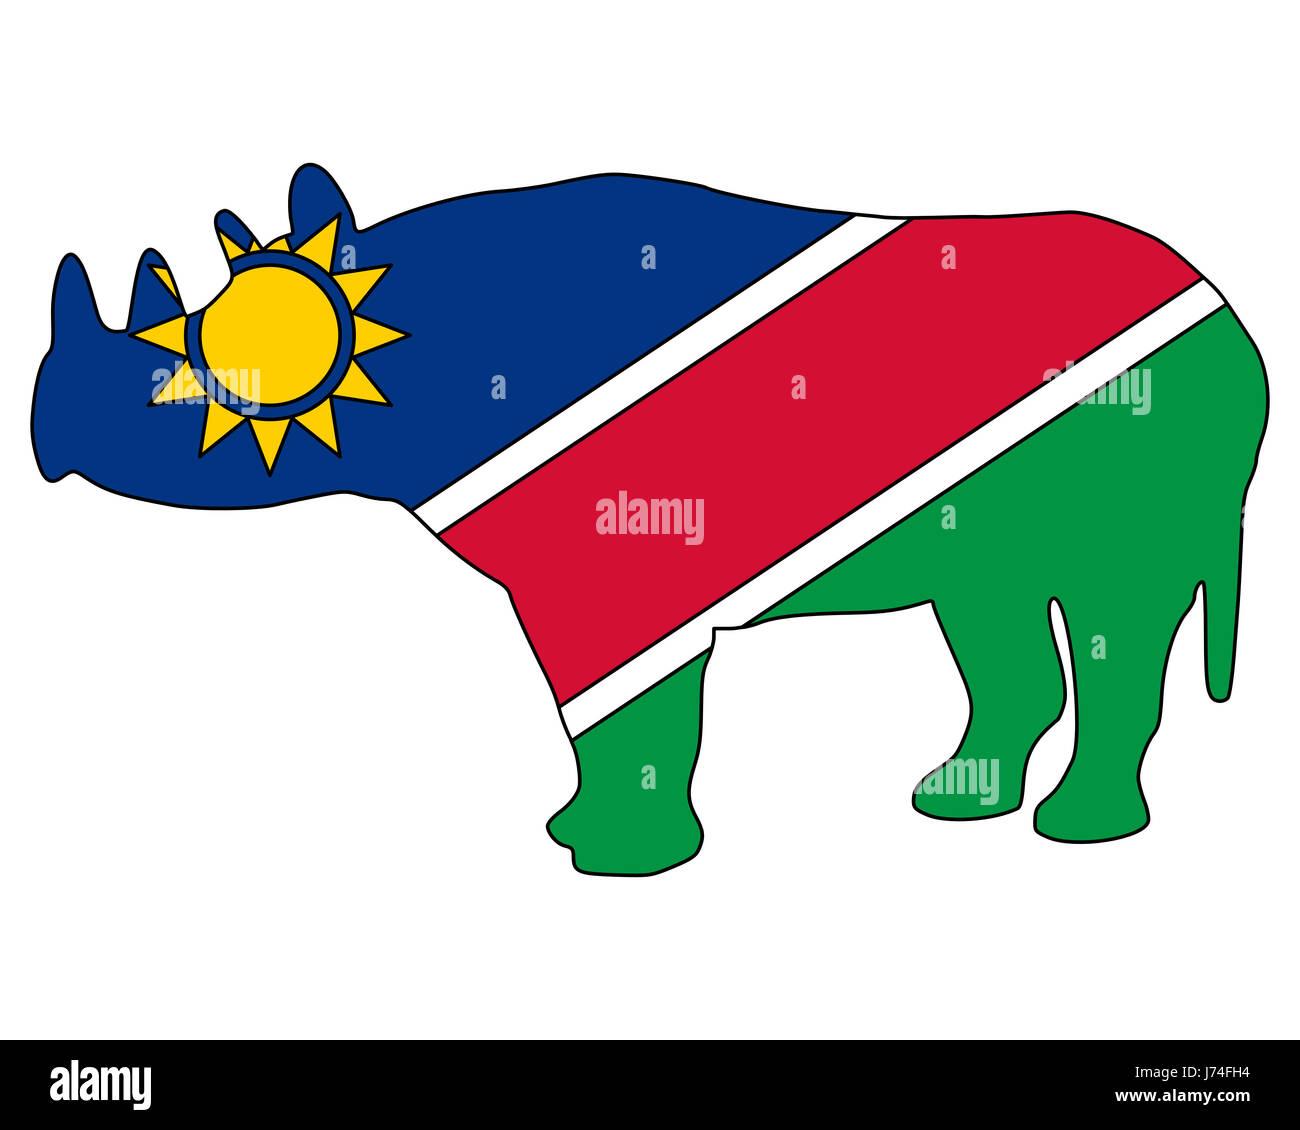 Drapeau Namibie Afrique rhinocéros rhinocéros bleu signal signe ...